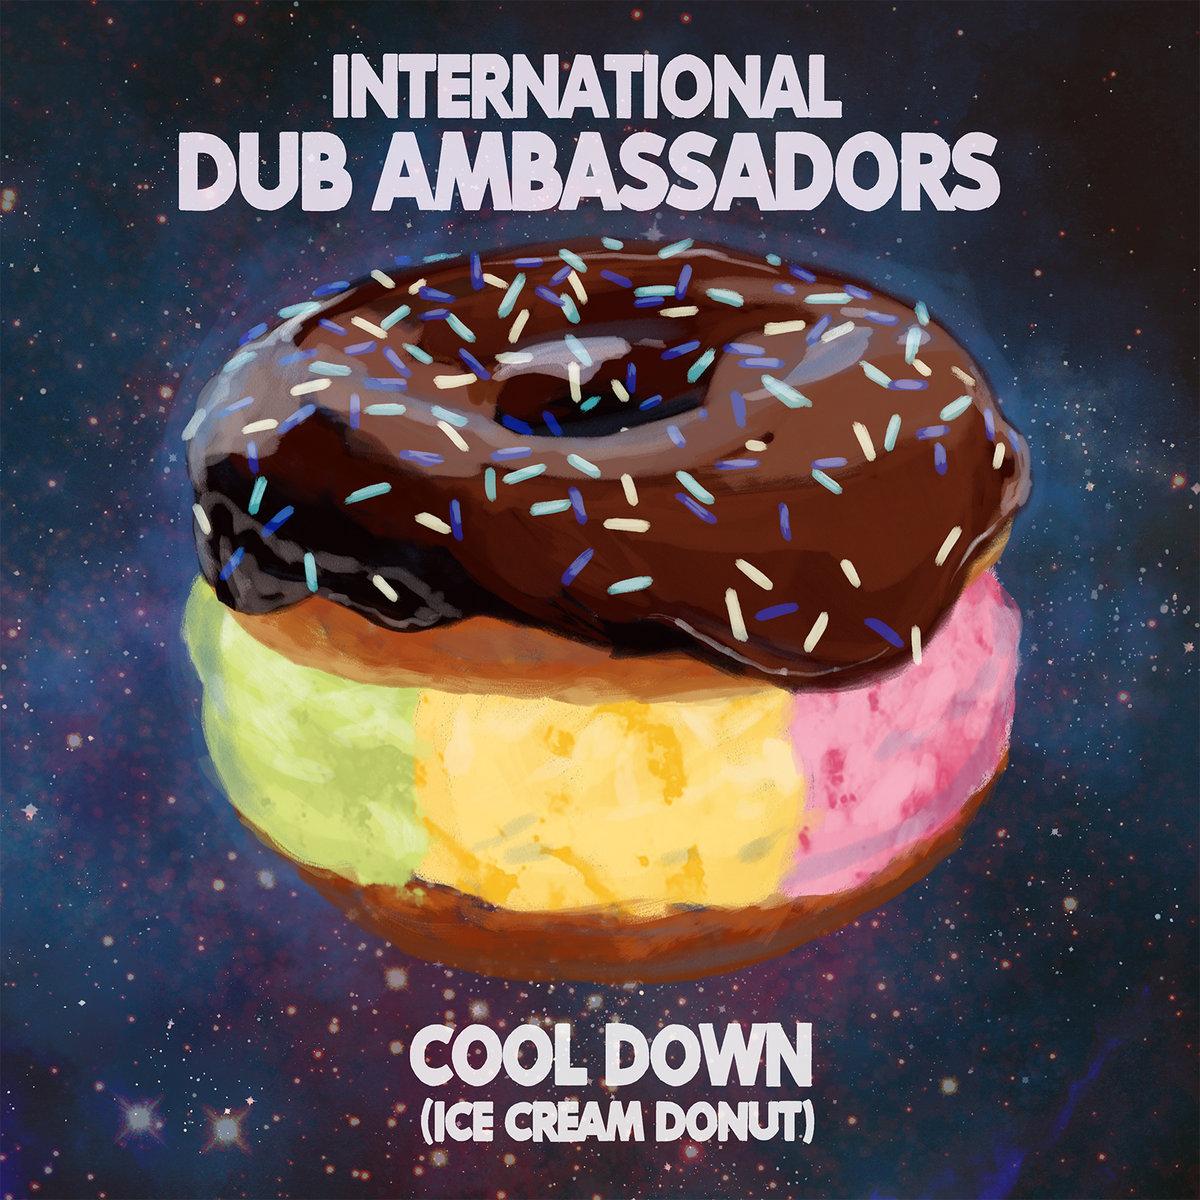 Cool Down (Ice Cream Donut)   International Dub Ambassadors